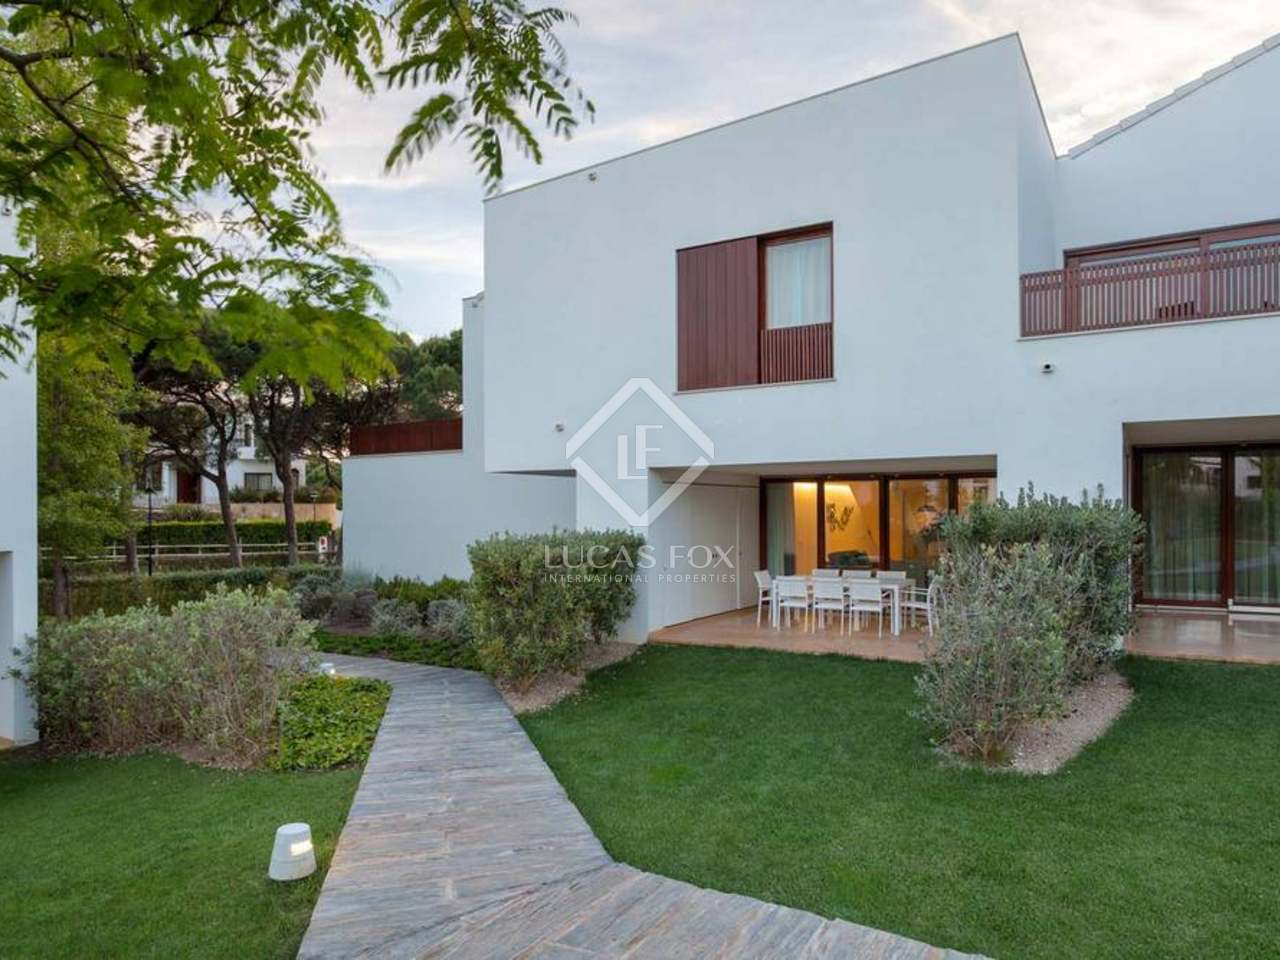 166m haus villa zum verkauf in algarve portugal. Black Bedroom Furniture Sets. Home Design Ideas